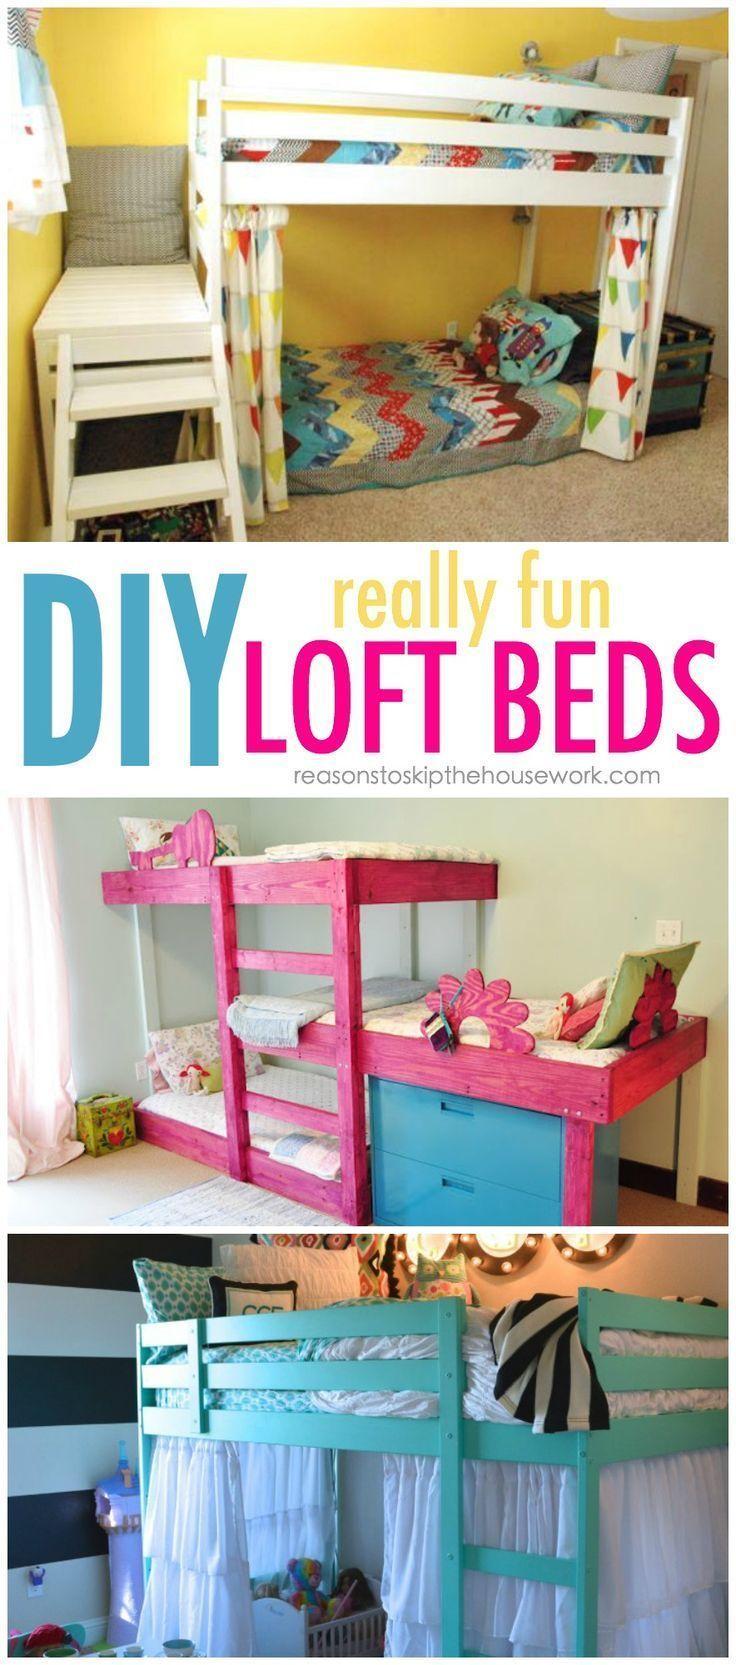 Diy Bunk Beds Tutorials And Plans Diy Stuff I Wanna Make